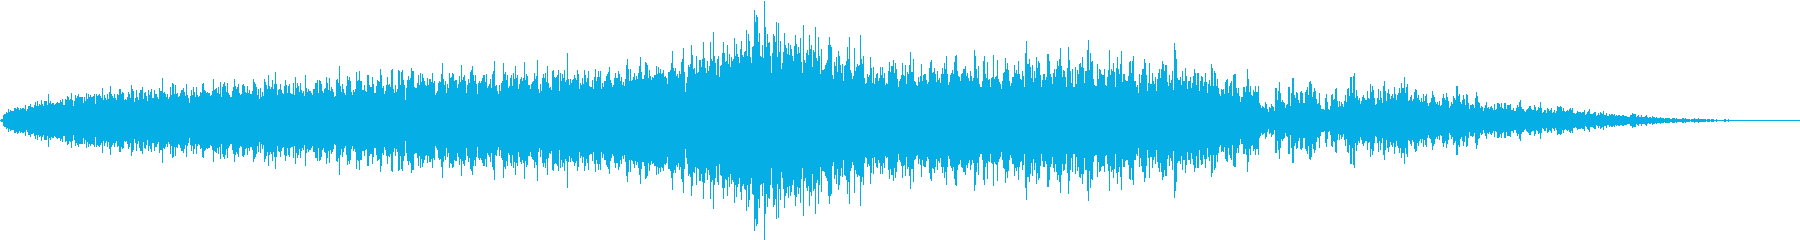 SciFiLasersWeapon...の再生済みの波形